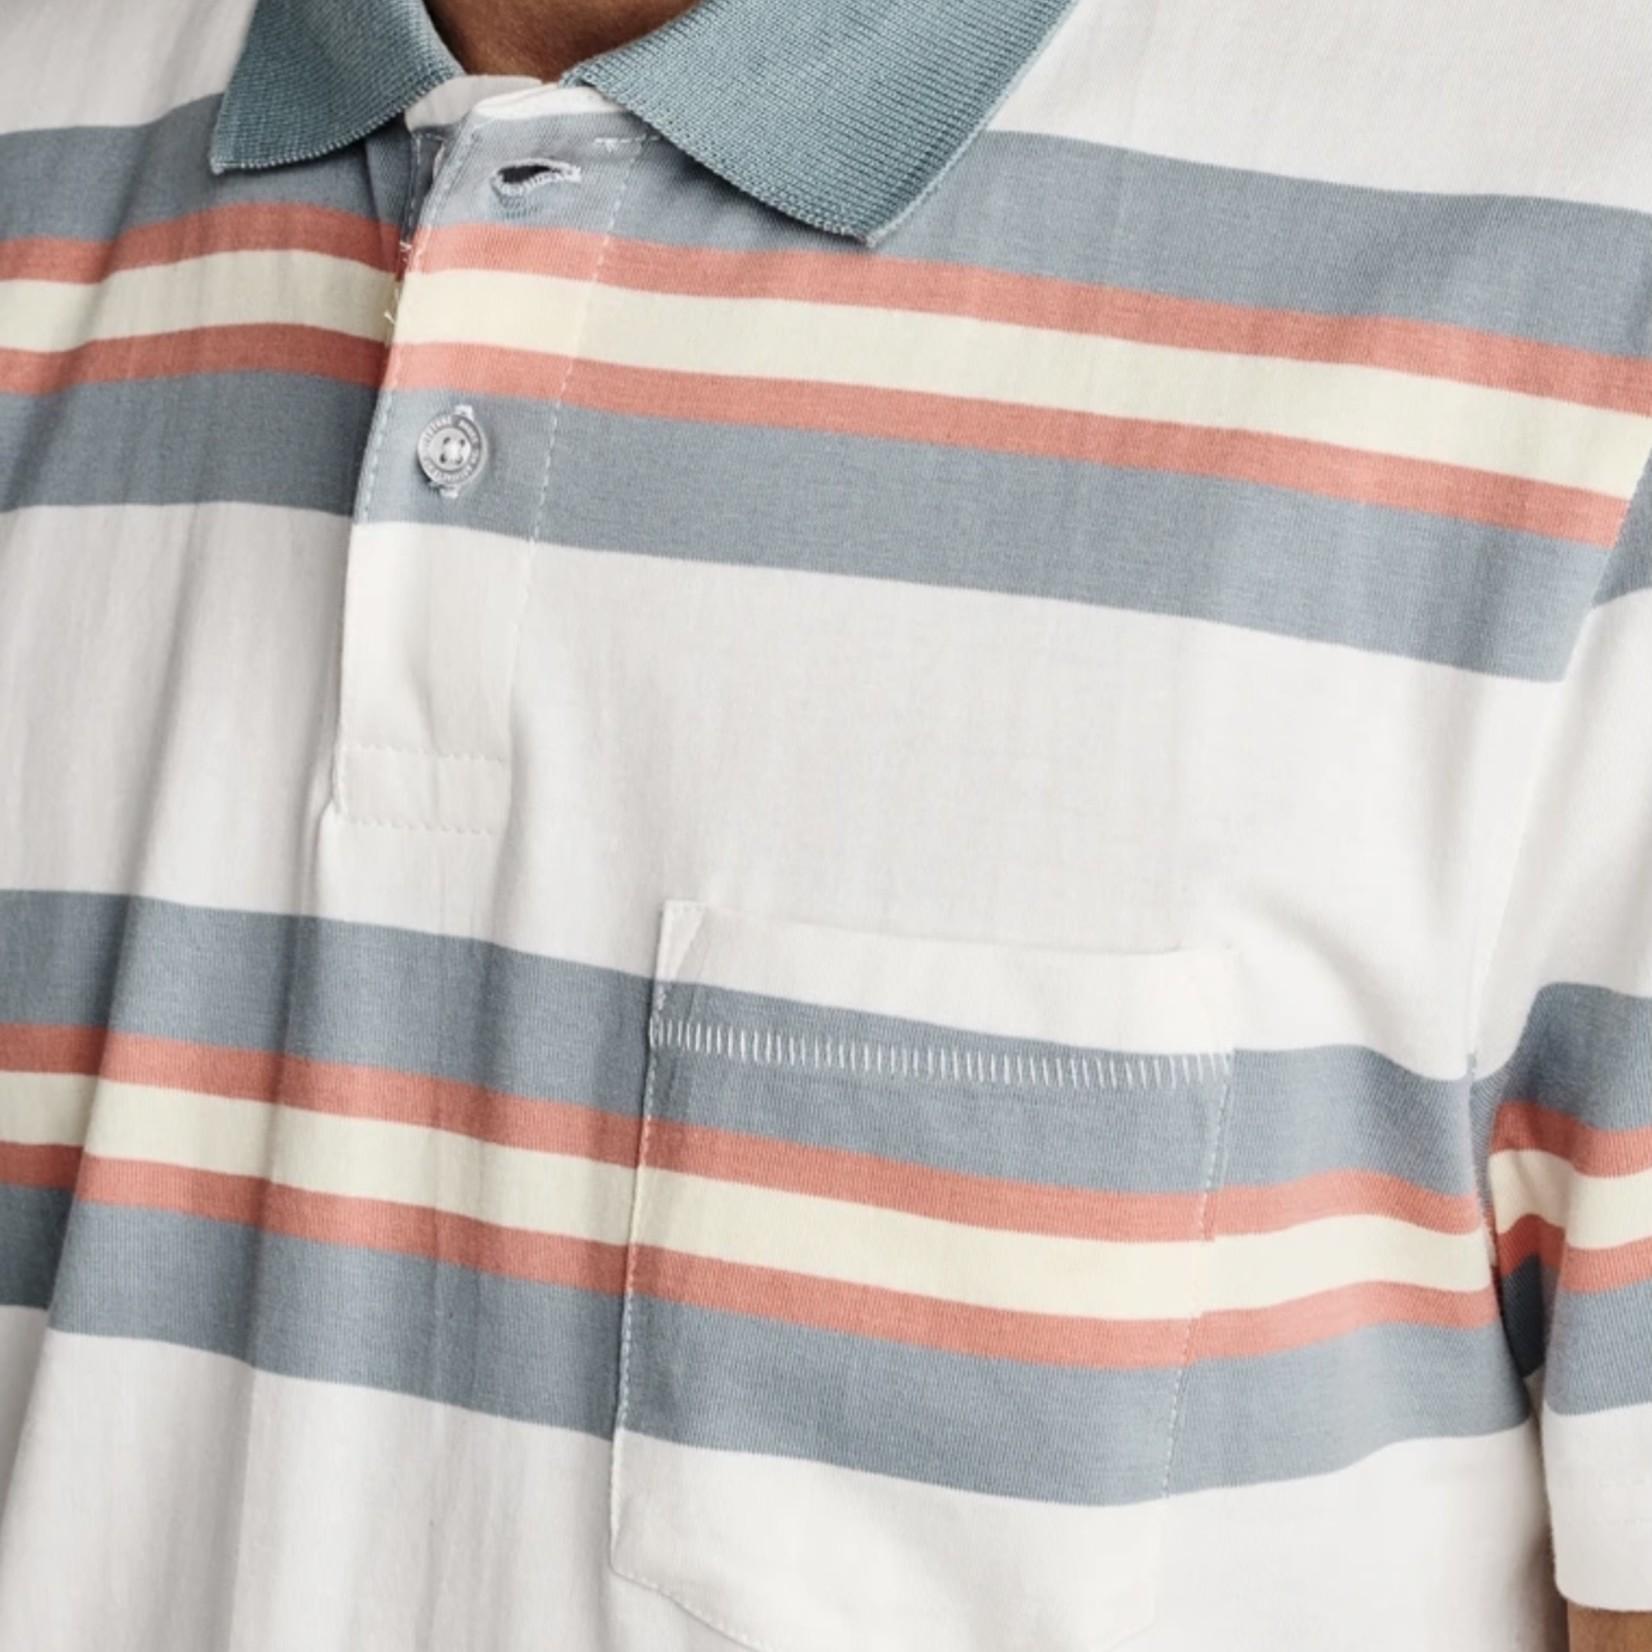 Roark Roark One Eyed Jack Shirt